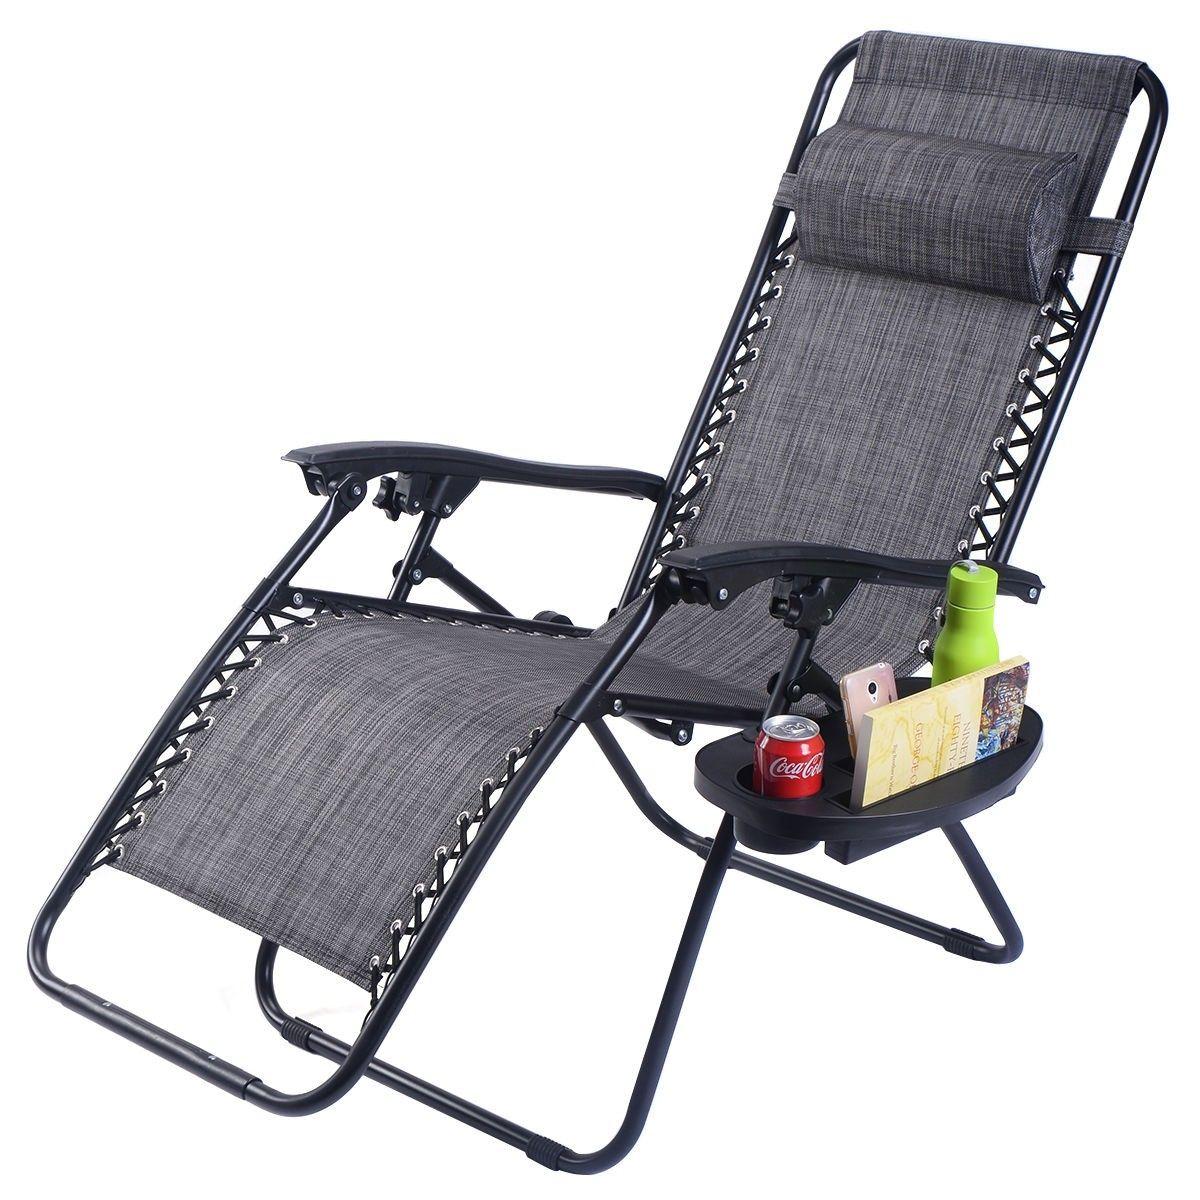 Outdoor Folding Zero Gravity Reclining Lounge Chair Zero Gravity Chair Outdoor Outdoor Chairs Beach Chairs